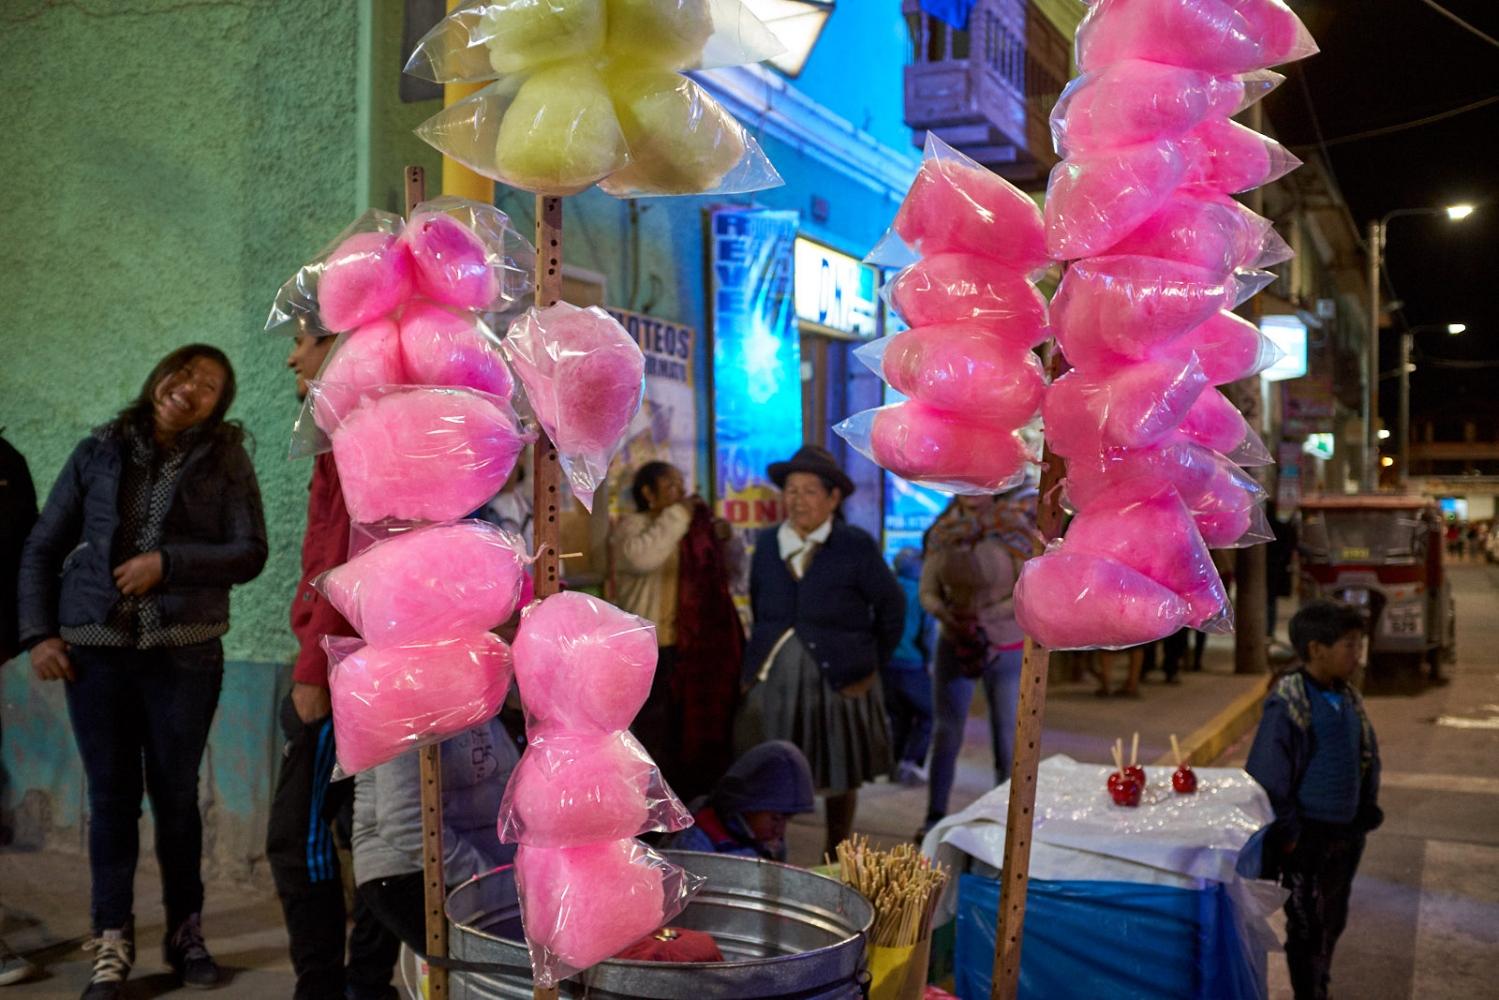 Cotton Candy cart, Plaza de Armas, Calca, Peru.